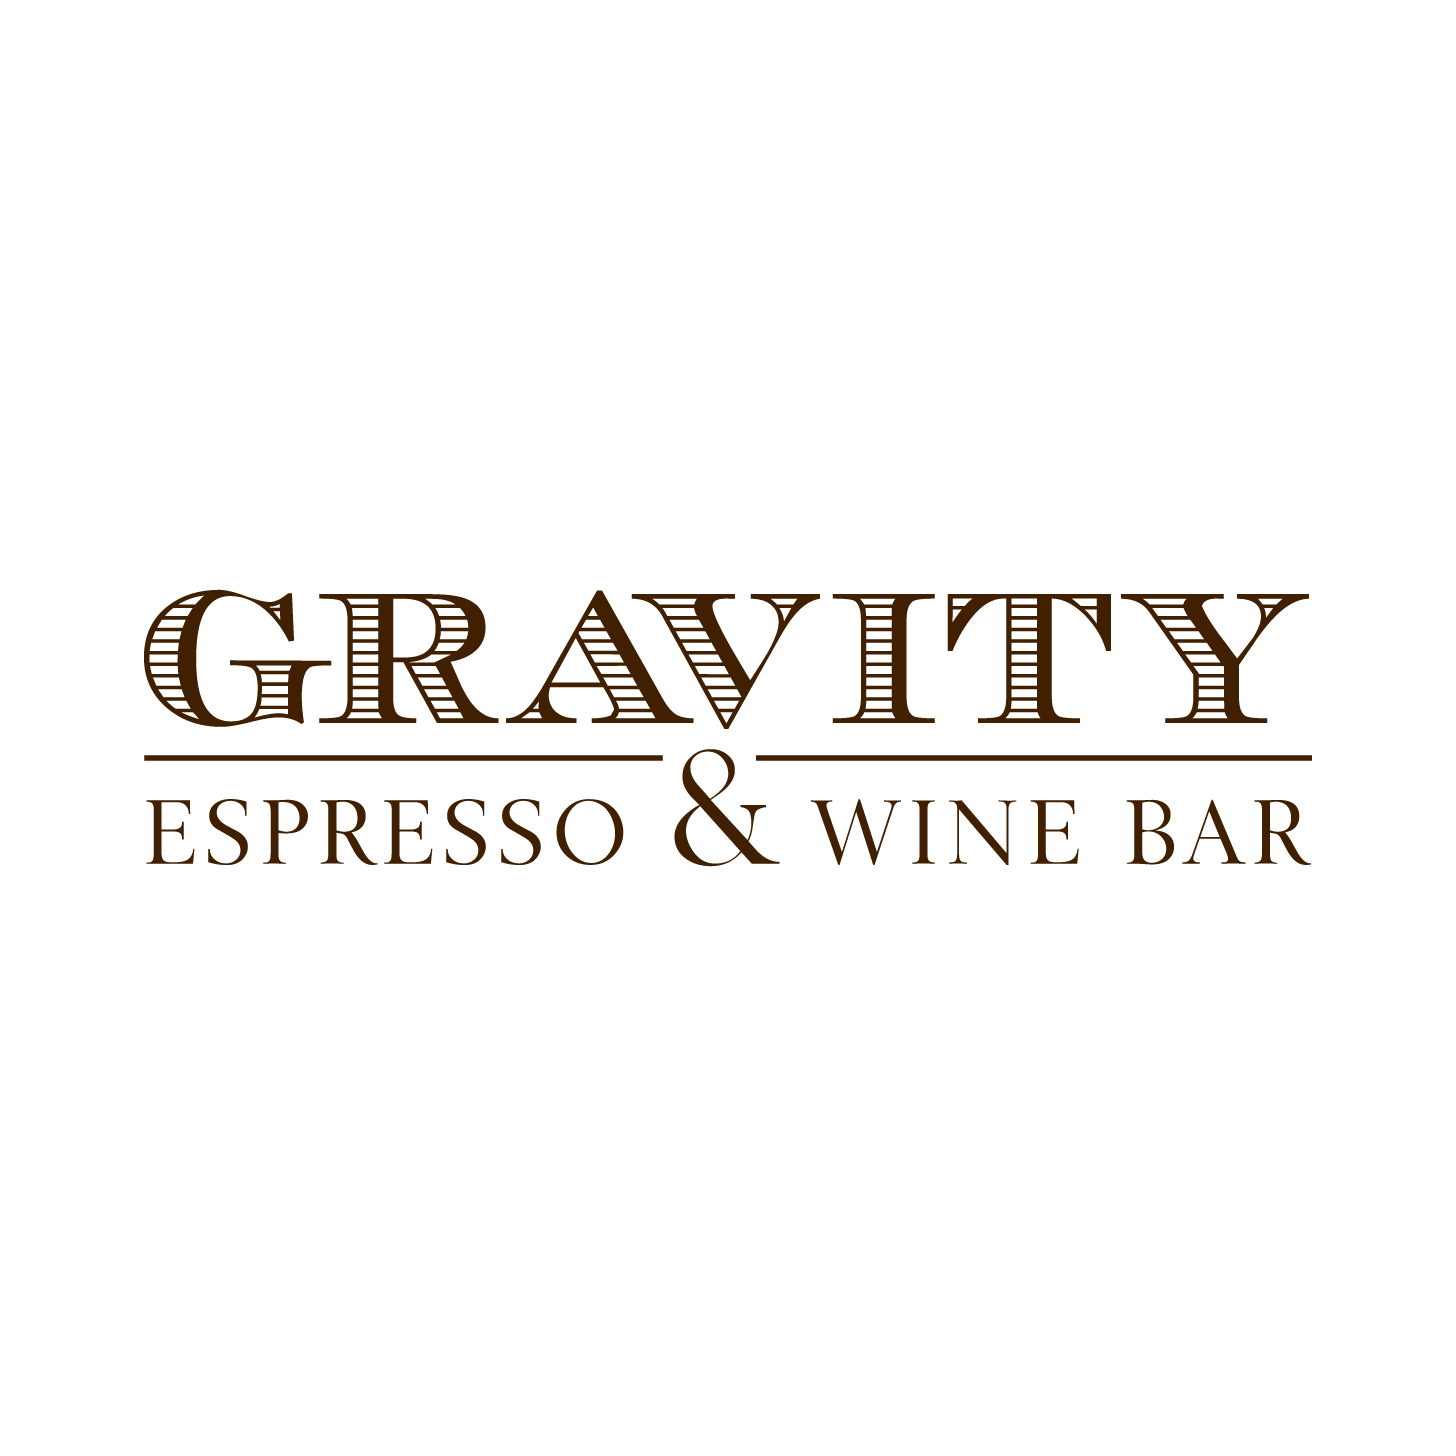 Gravity espresso and wine bar logo